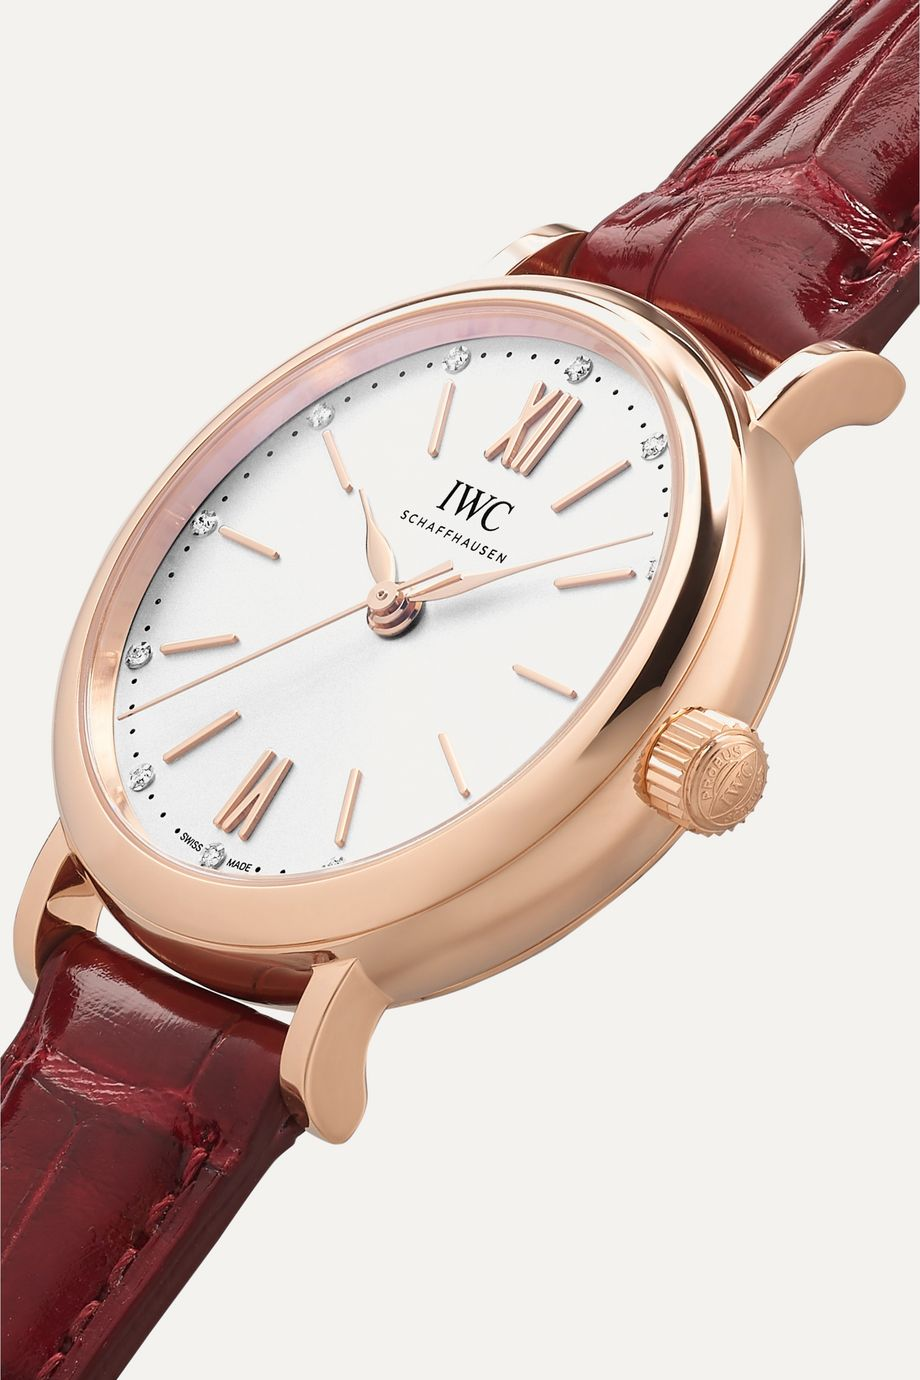 IWC SCHAFFHAUSEN Portofino Automatic 34mm 18-karat red gold, alligator and diamond watch